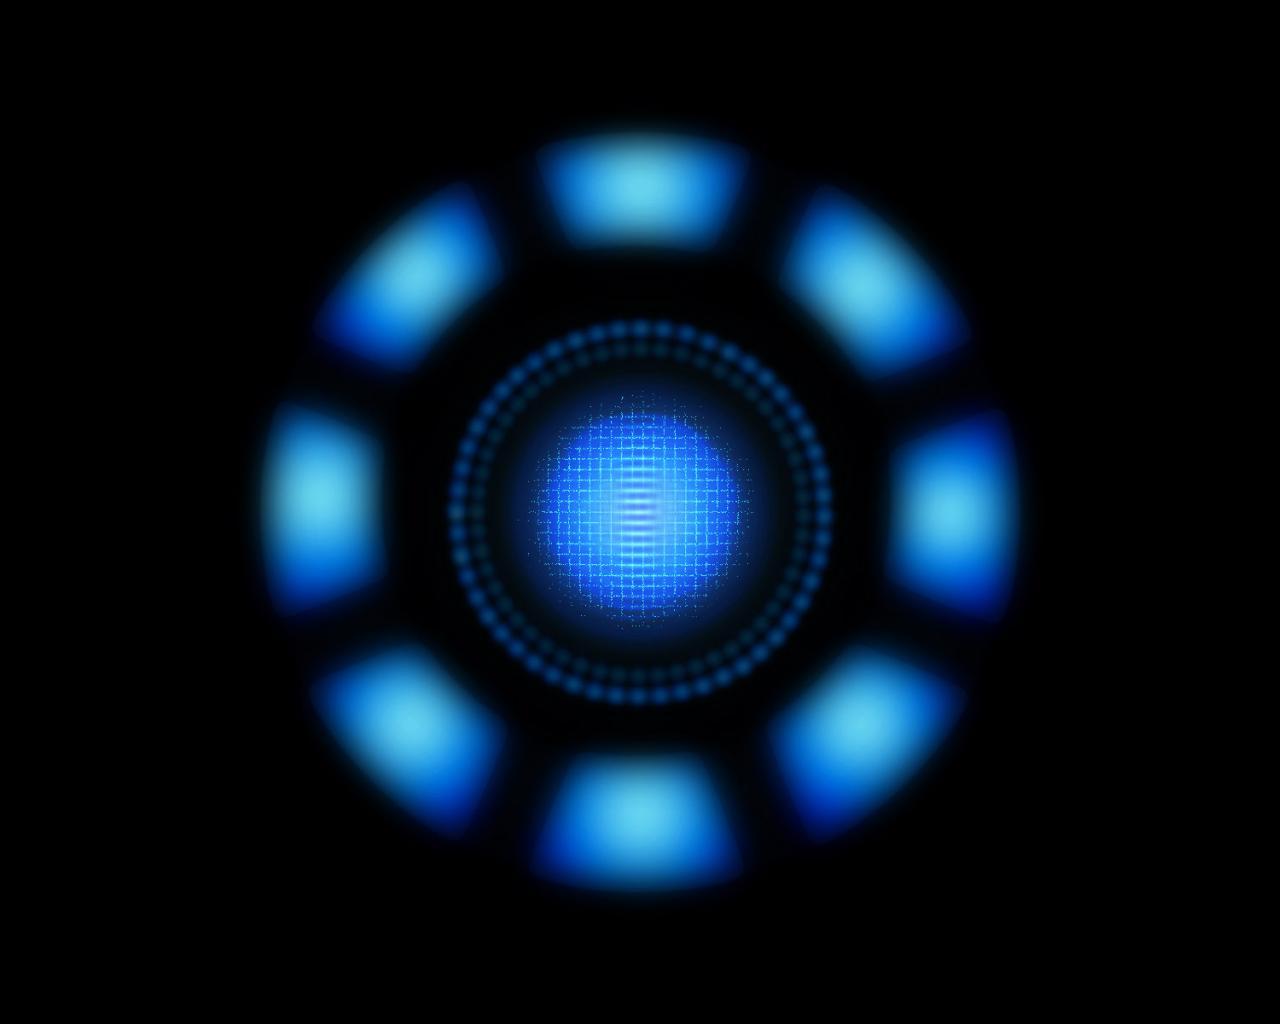 minimalistic iron man arc reactor desktop 1920x1200 hd wallpaper 1280x1024